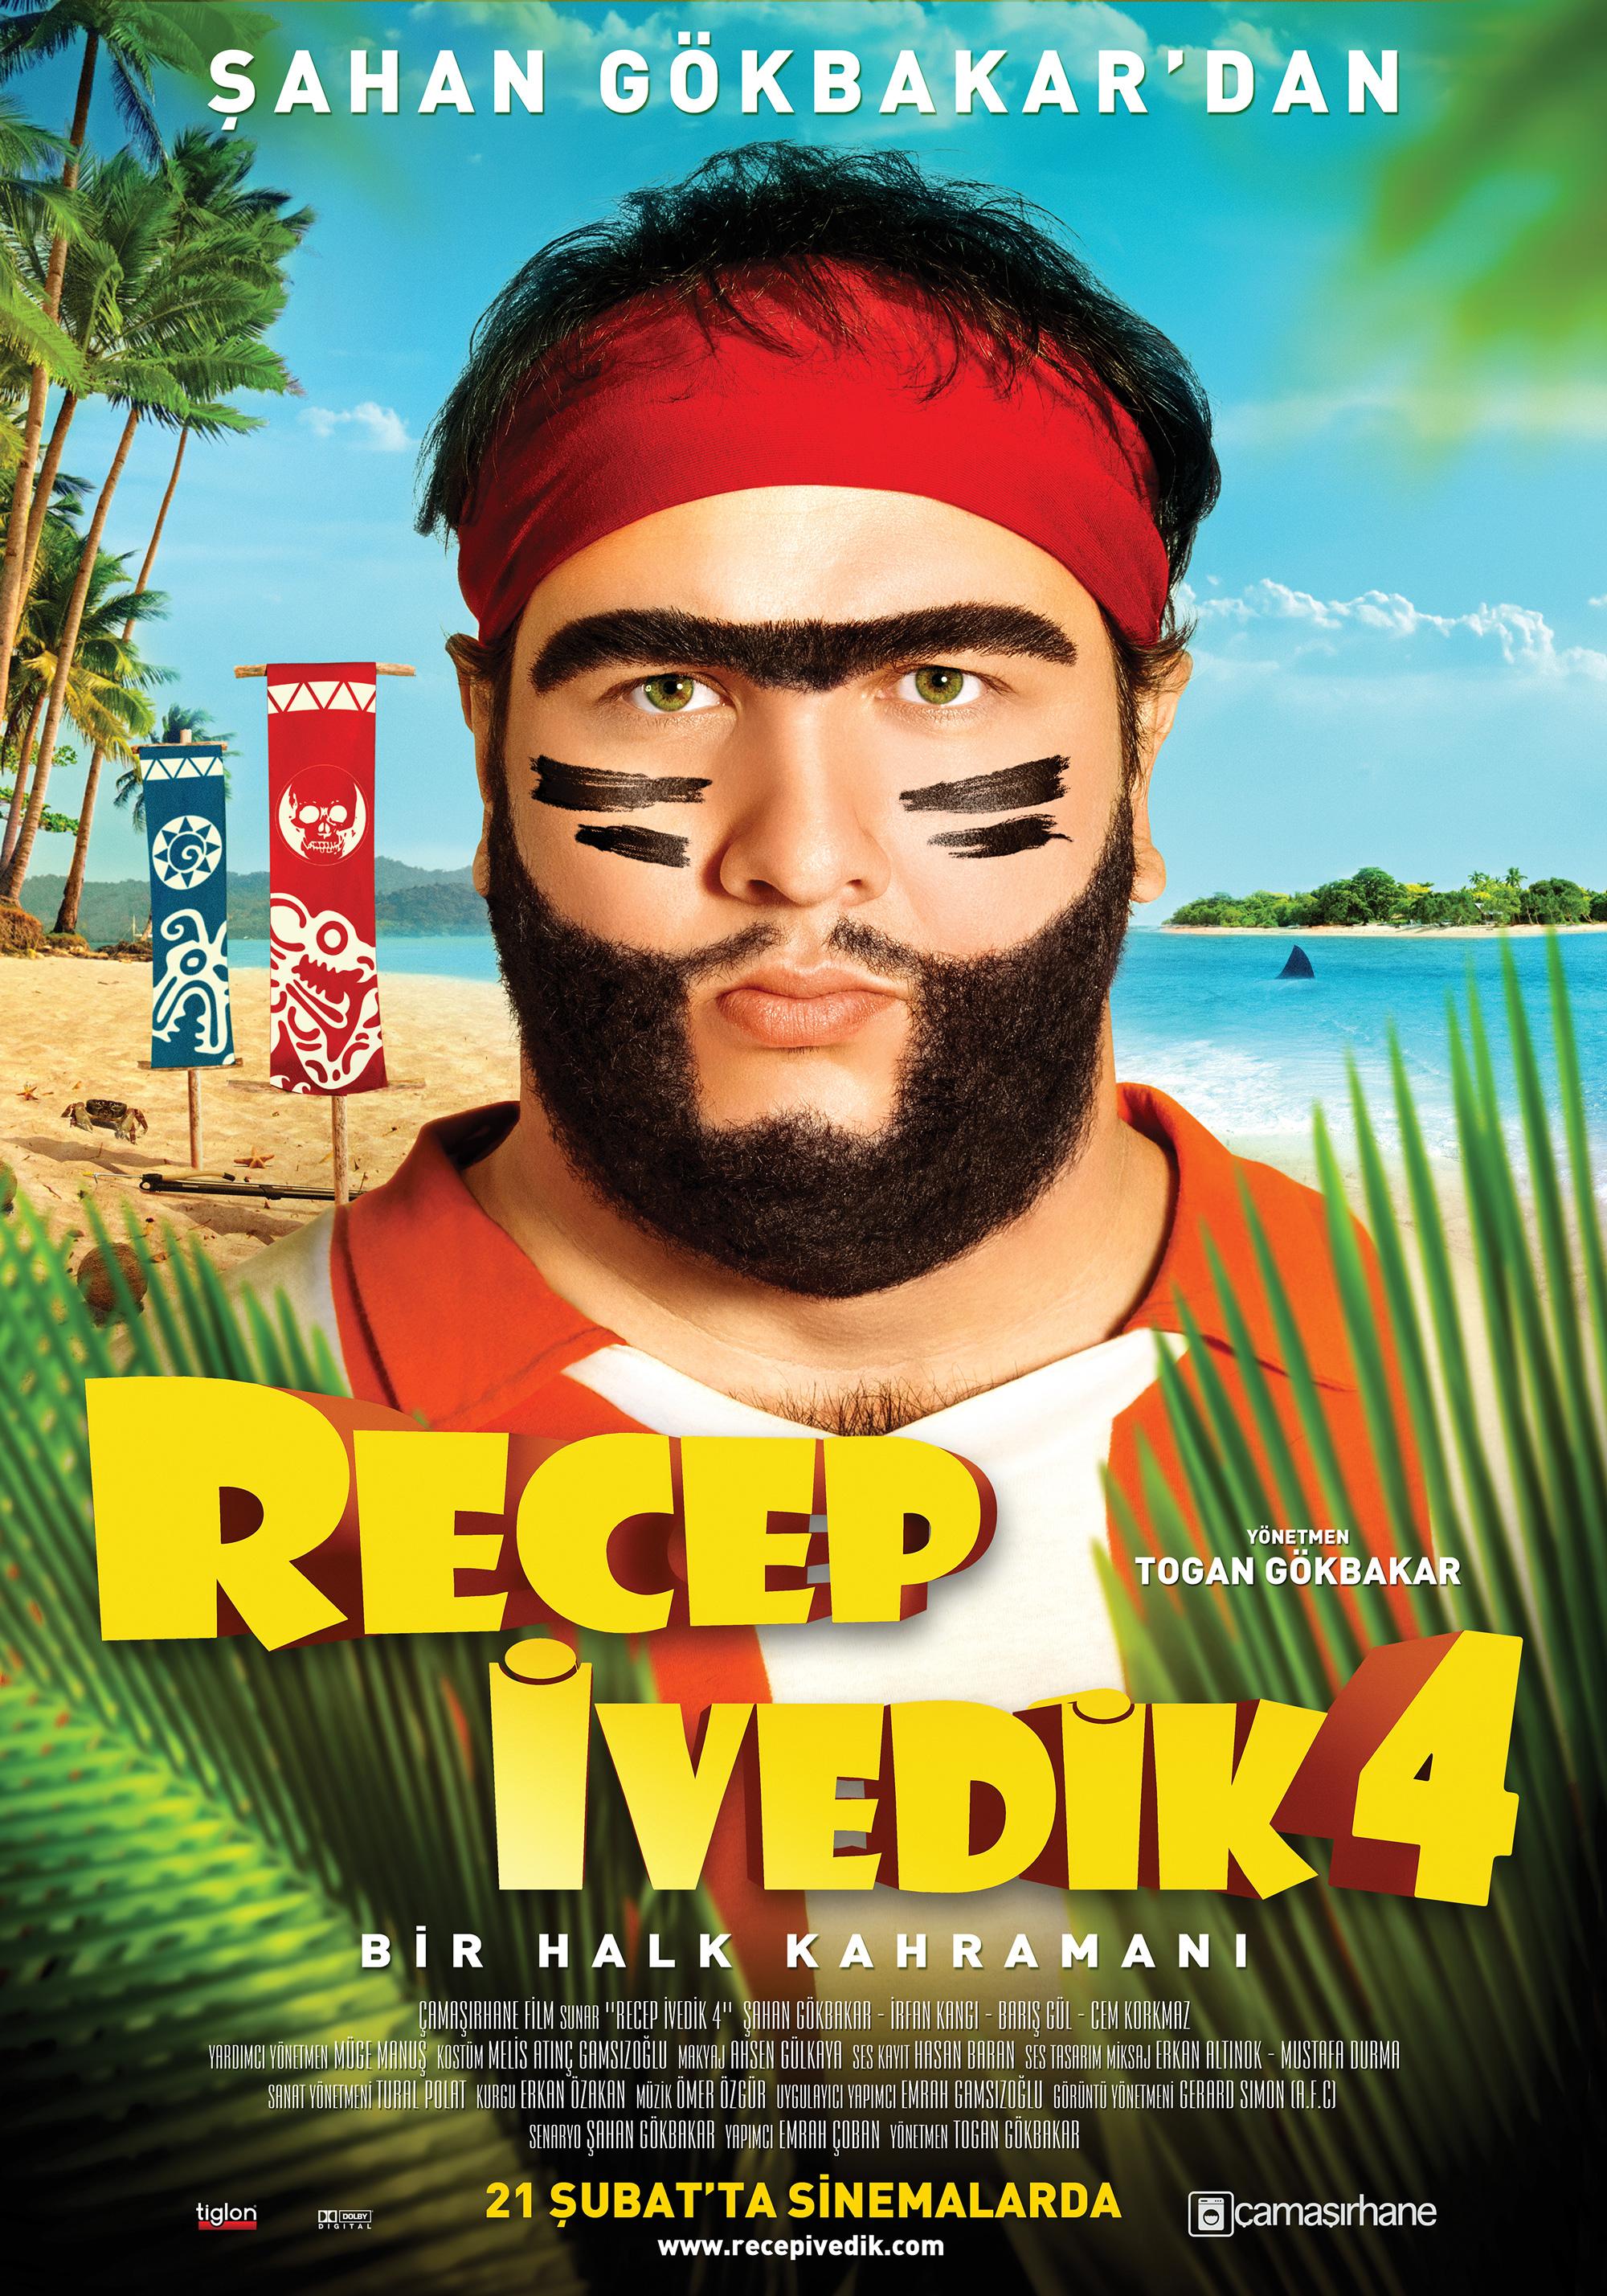 http://68filmizle.blogspot.com.tr/2015/06/recep-ivedik-4-full-tek-parca-hd-izle.html